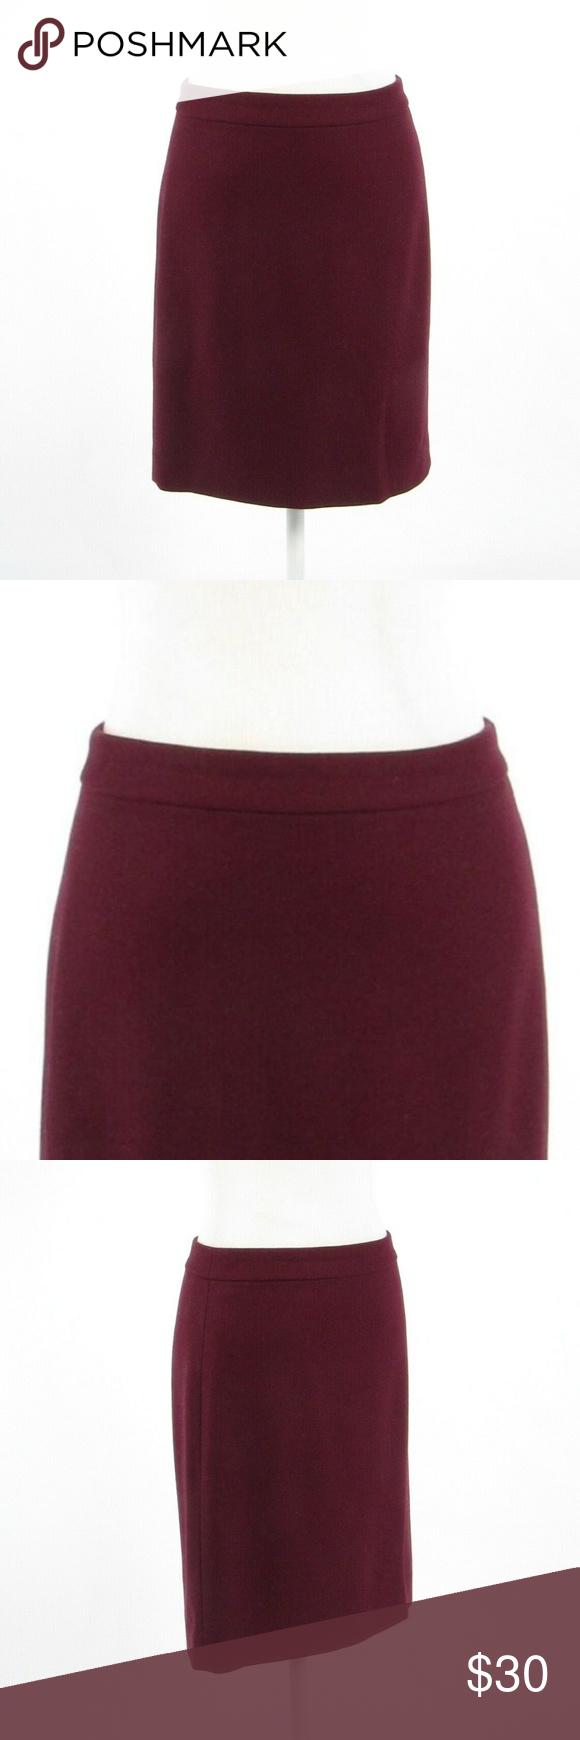 9cccb4d996 J. Crew maroon red pencil skirt 2 Maroon red Pencil skirt Hidden back  zipper Back slit Brand: J. Crew The Pencil Skirt Size: 2 Waist: 28